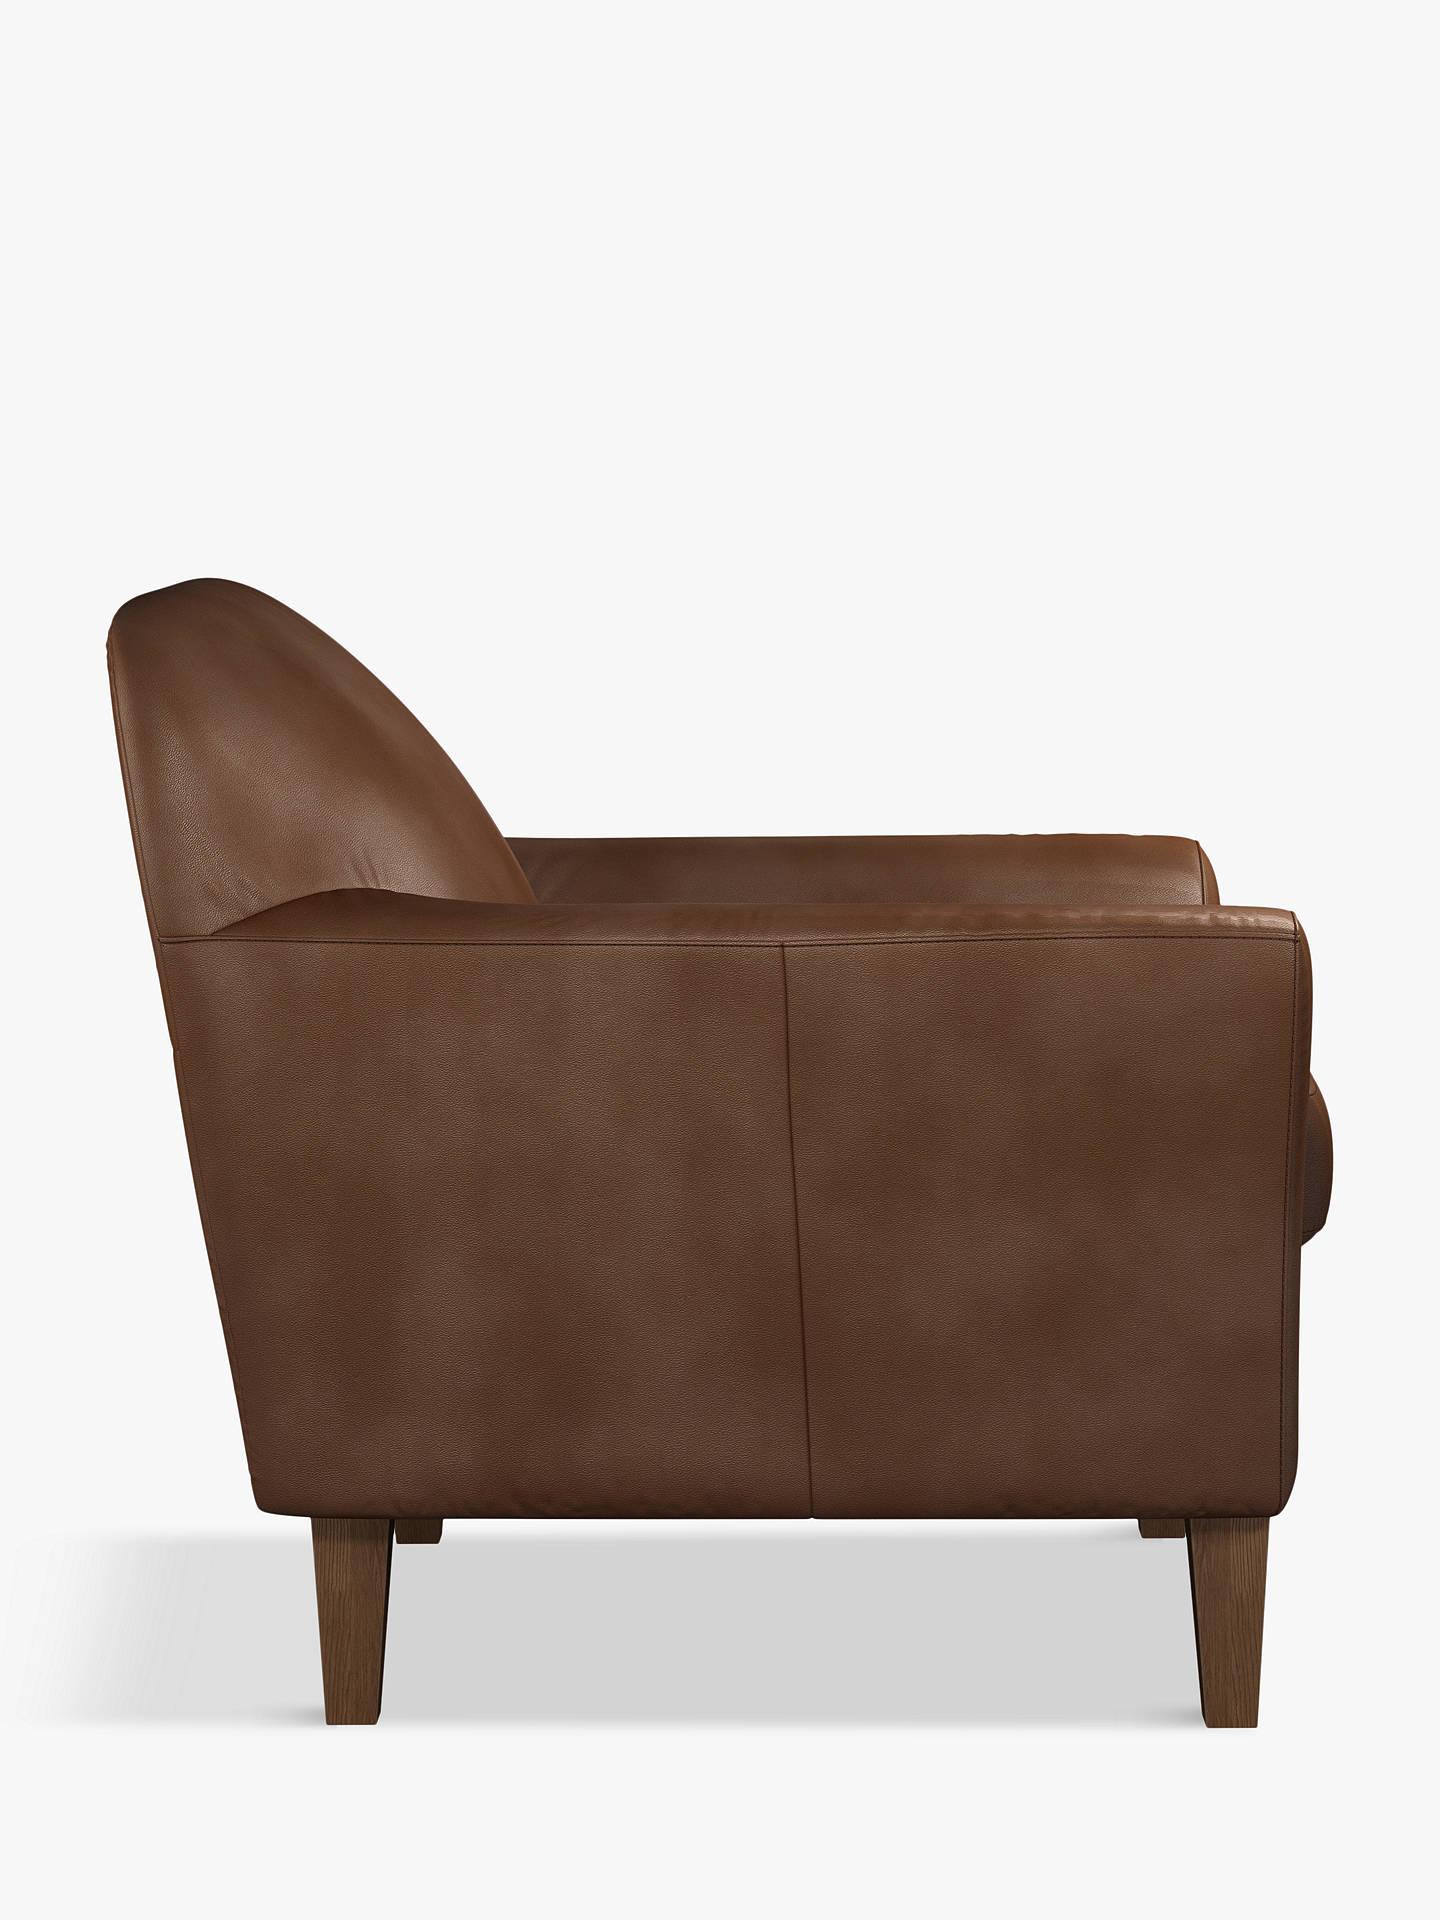 Astonishing John Lewis Partners Connor Leather Armchair Dark Leg Contempo Castanga Inzonedesignstudio Interior Chair Design Inzonedesignstudiocom